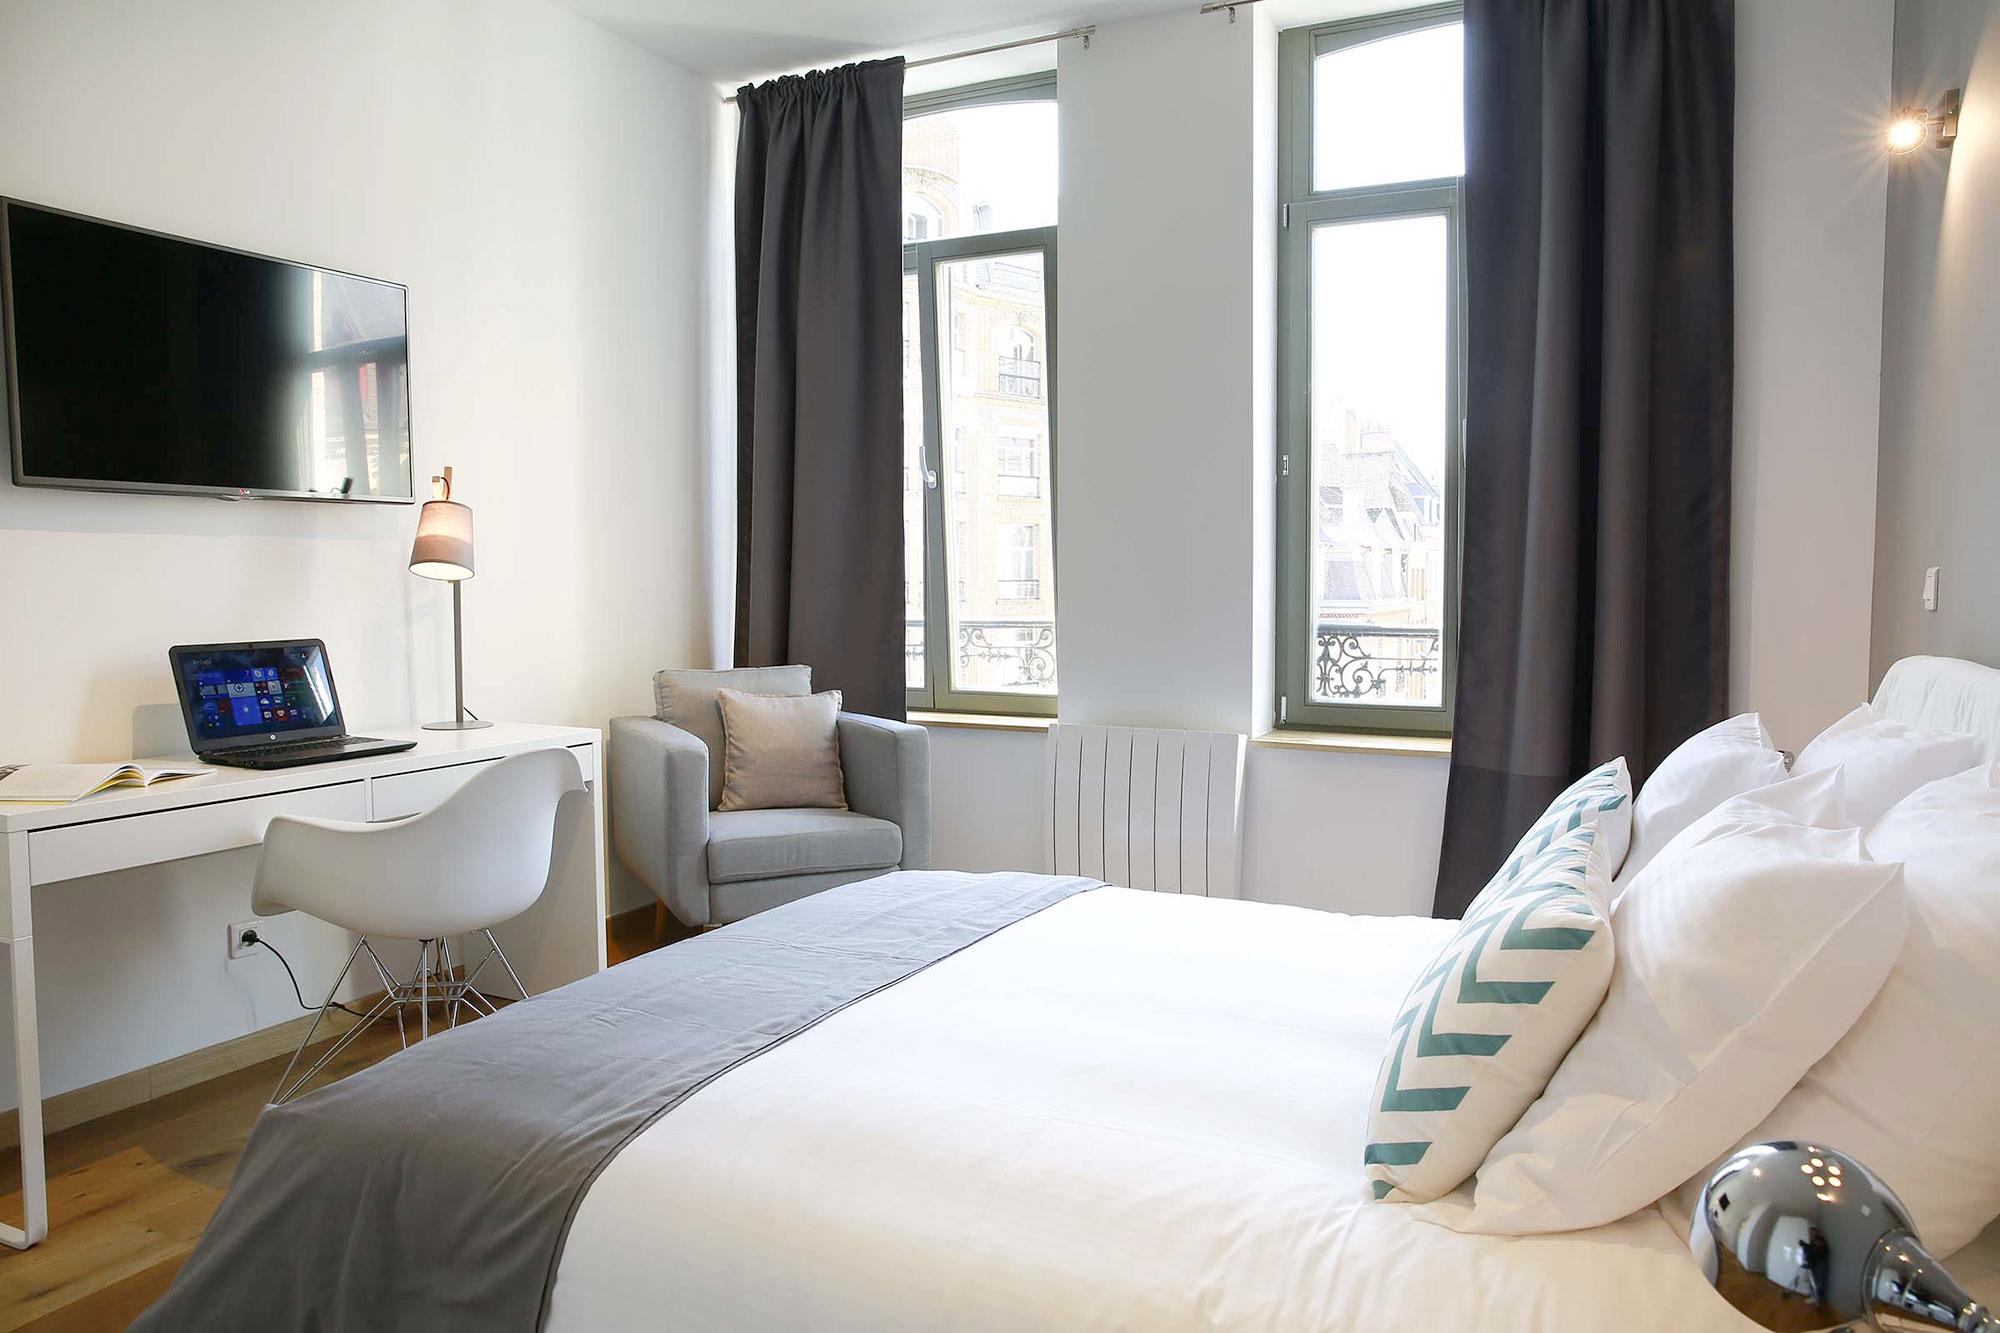 le vendome 21 flandres appart h tel lille. Black Bedroom Furniture Sets. Home Design Ideas